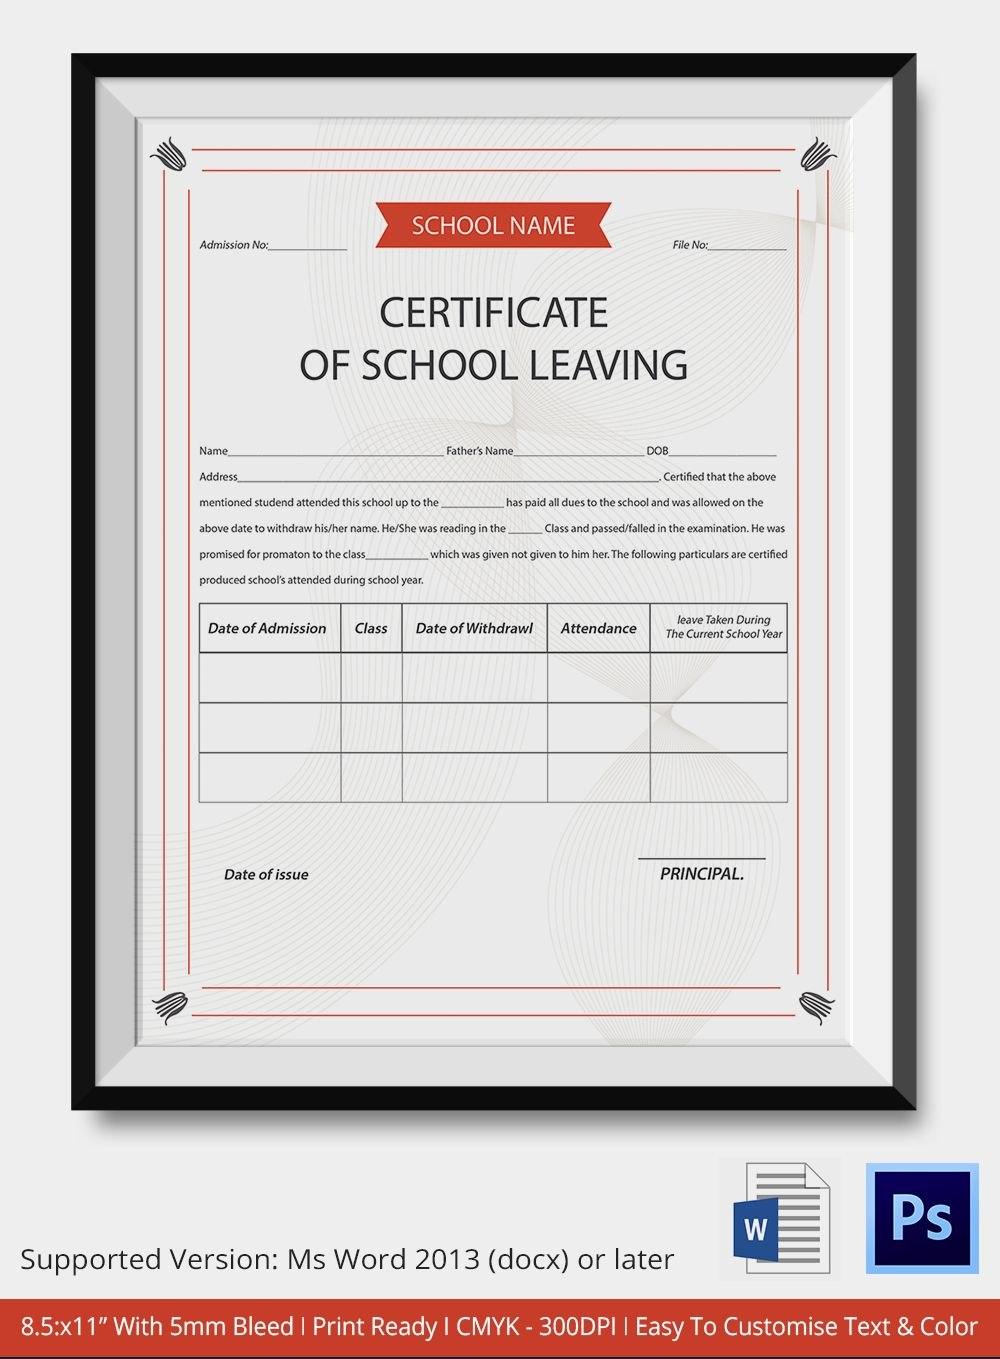 School Leaving Certificate Template  Certificate Templates  School Pertaining To Certificate Templates For School